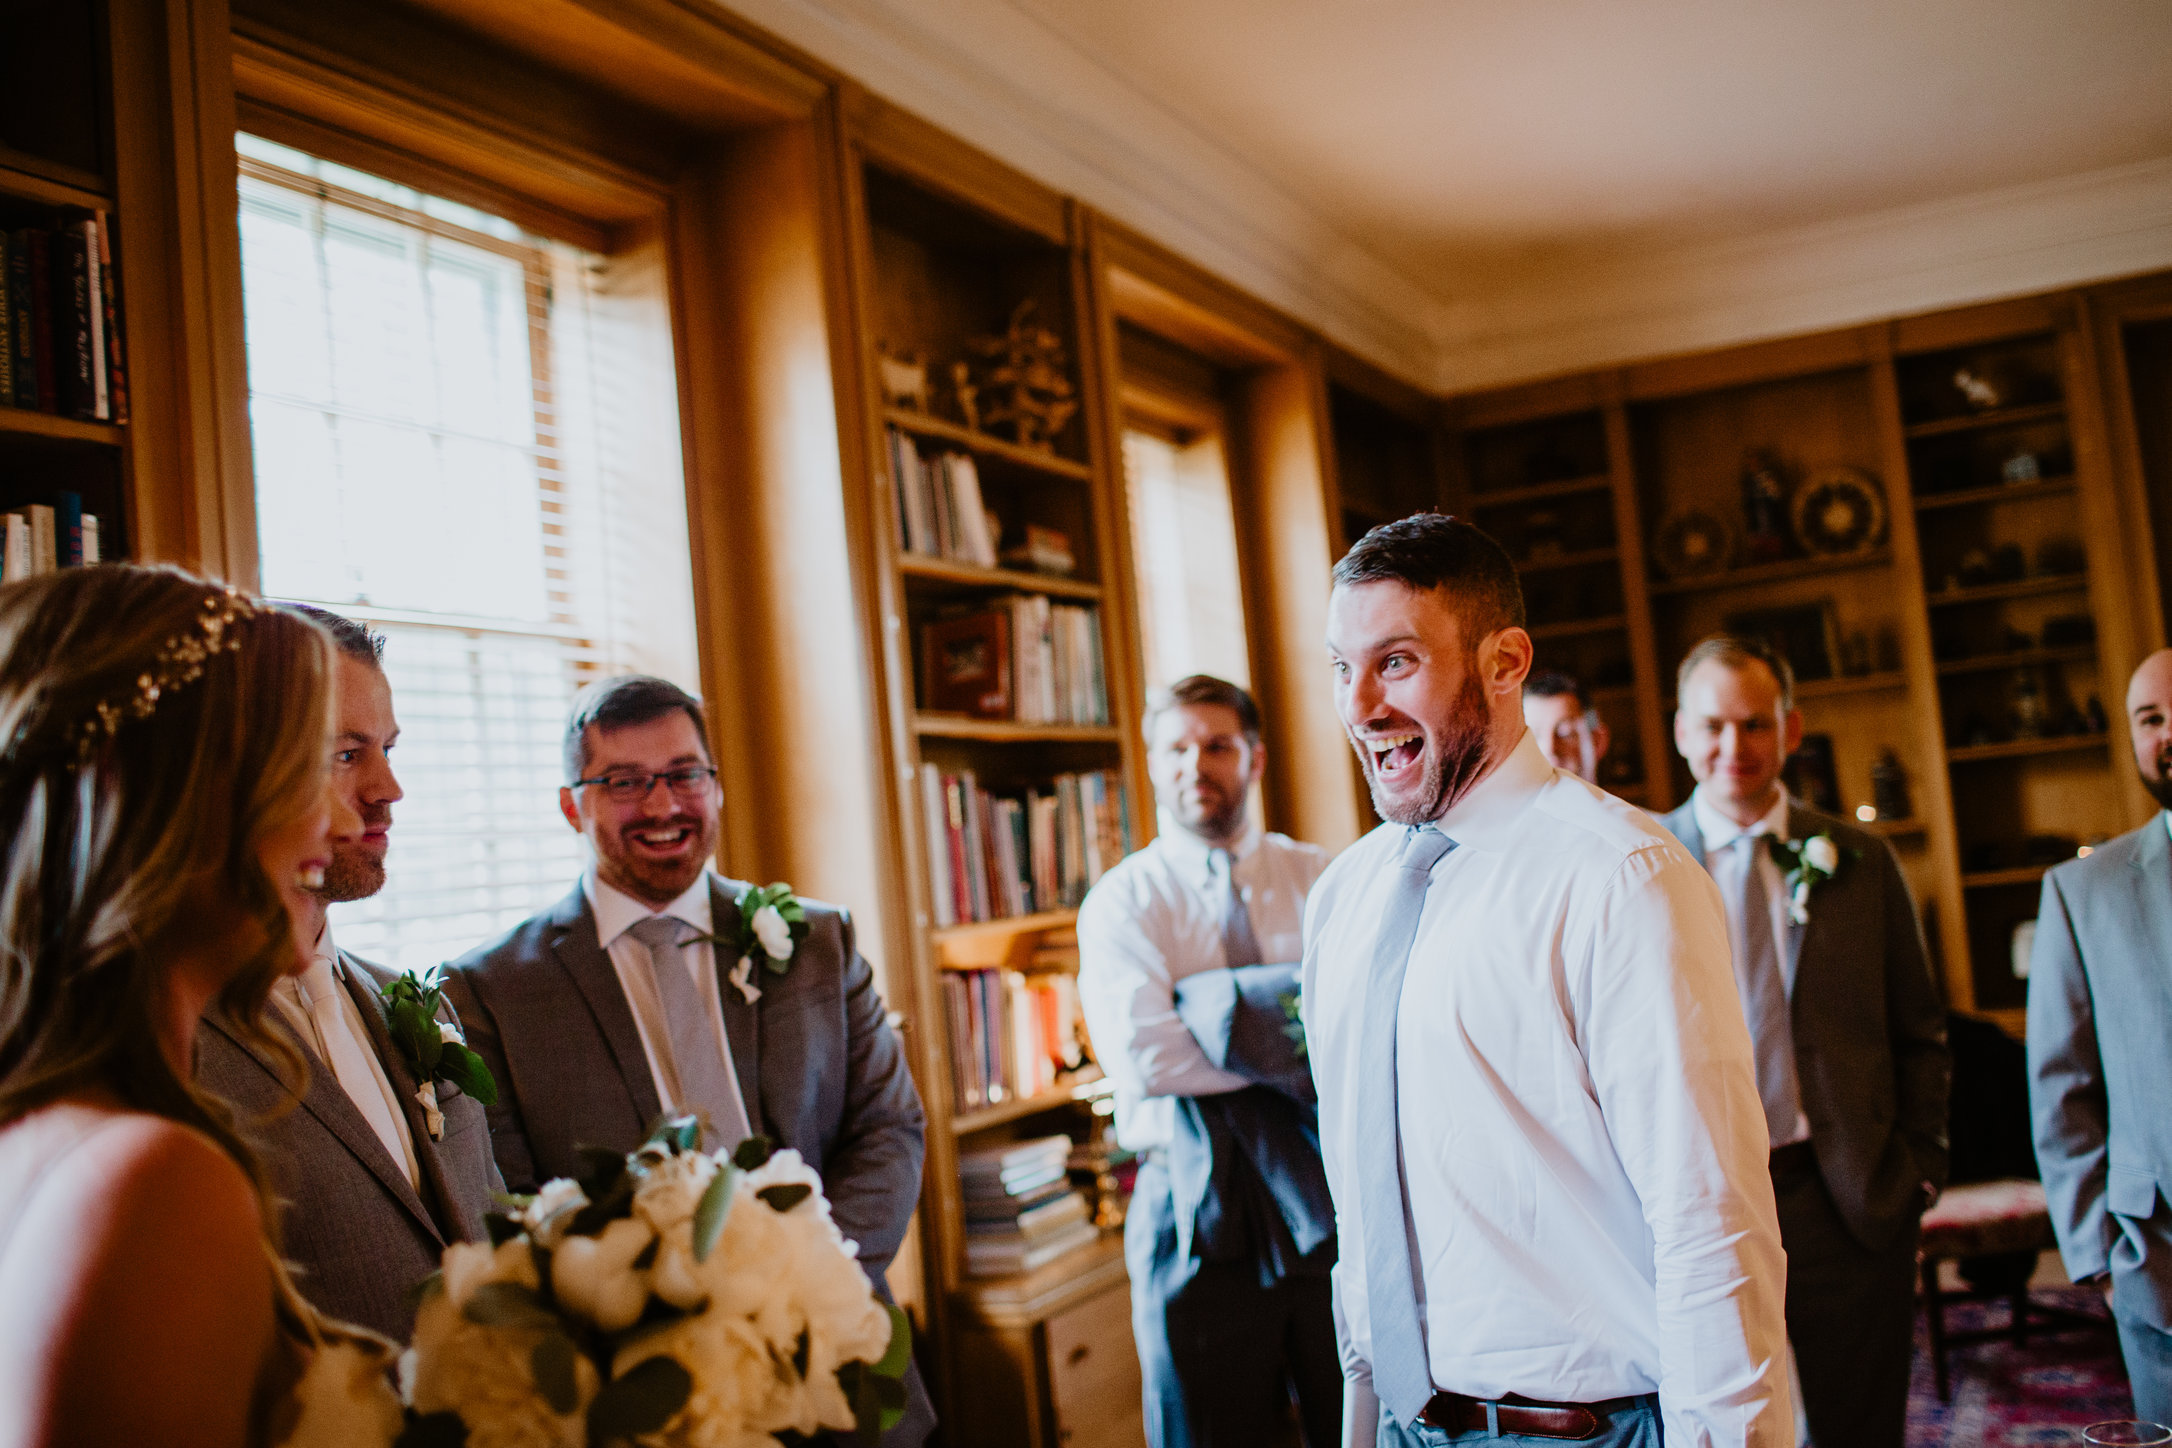 DandA-wedding-186.jpg